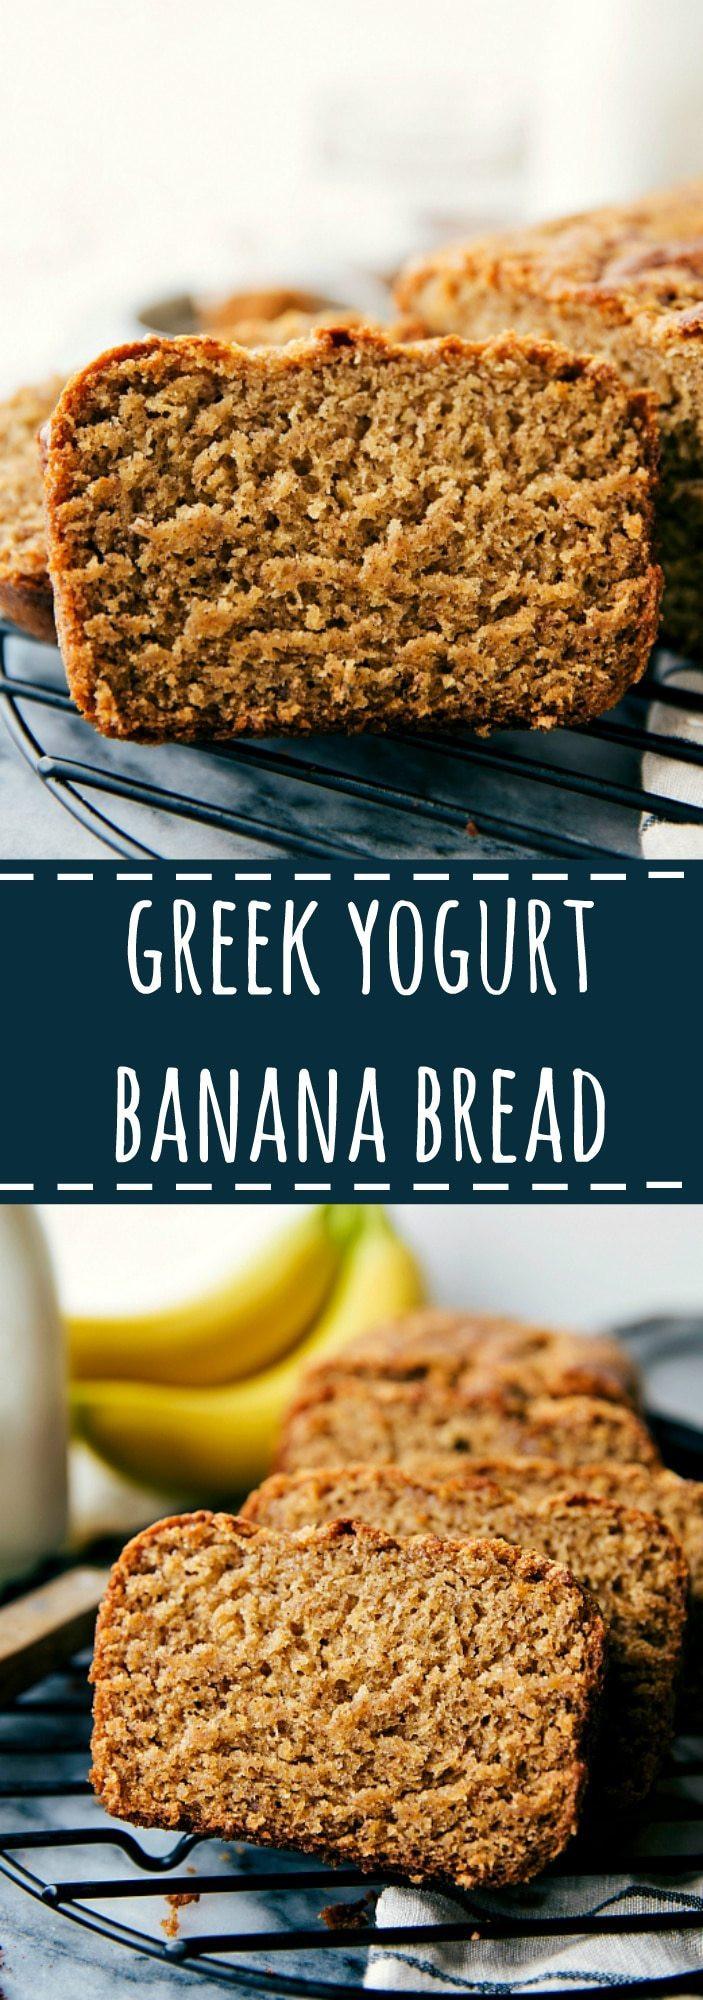 Healthy Banana Bread With Yogurt  Healthier Greek Yogurt Banana Bread Video Chelsea s